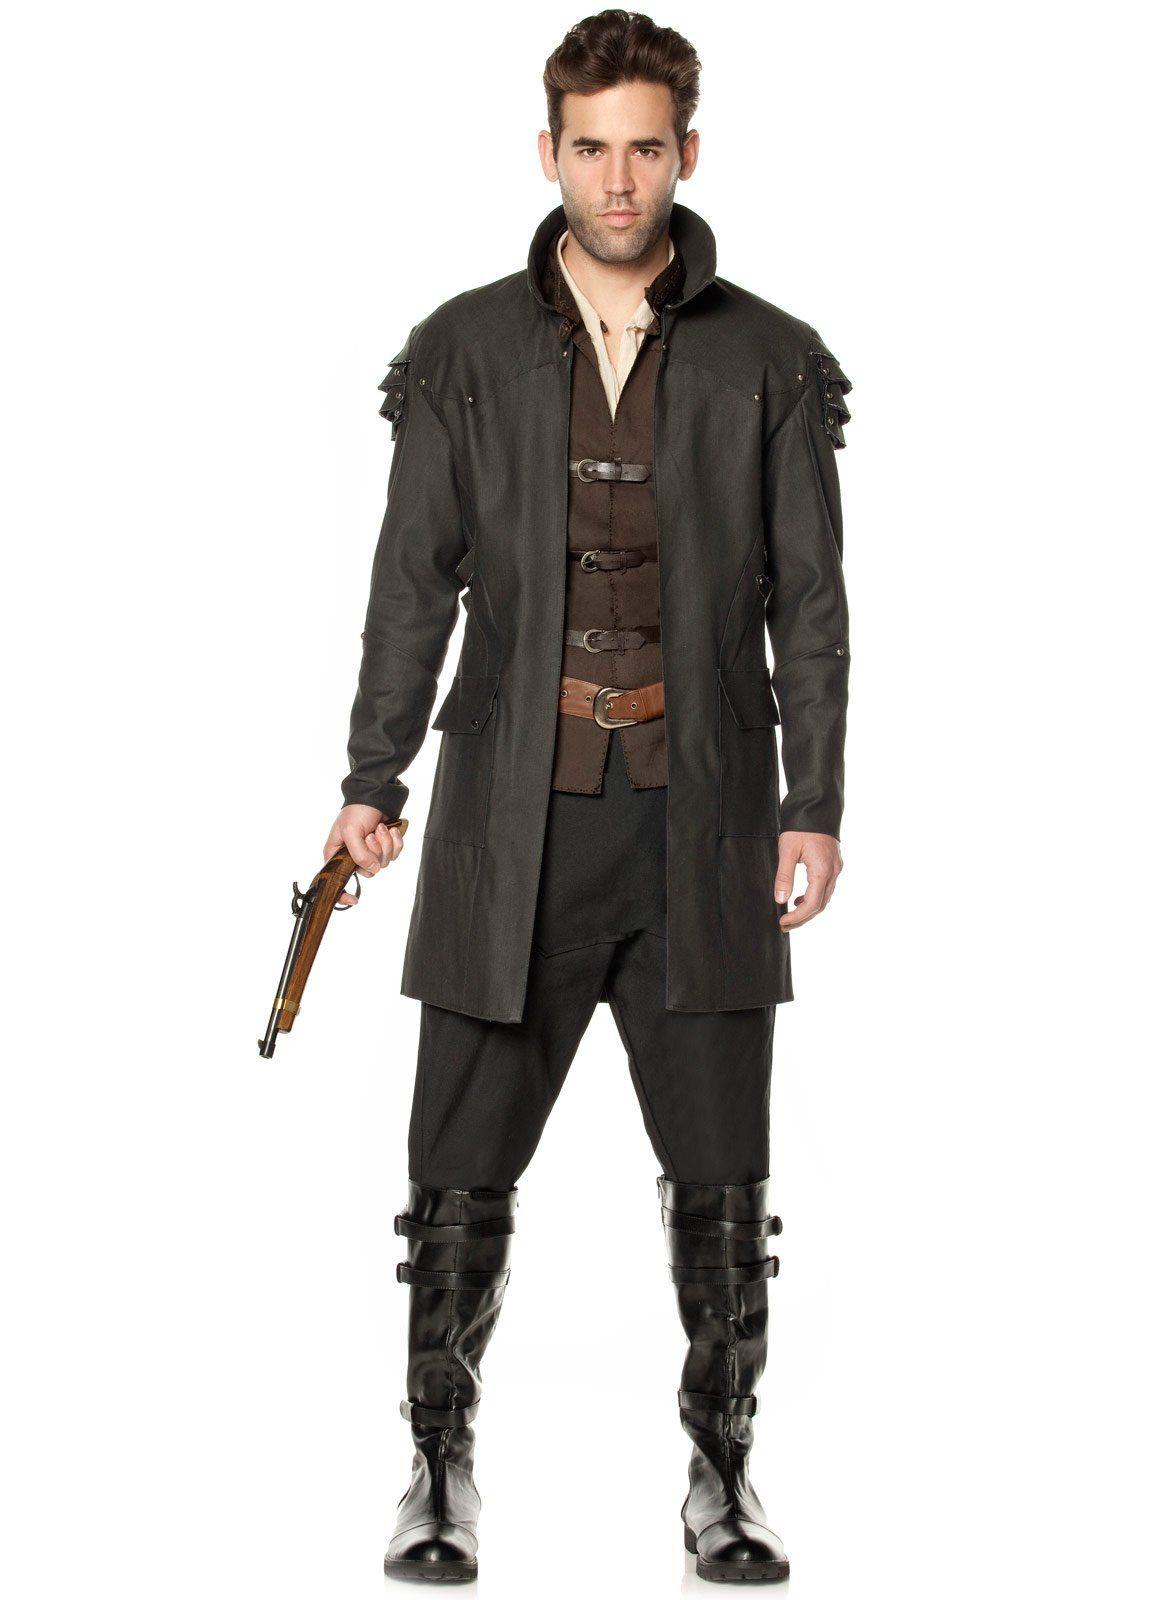 costume adult Hansel